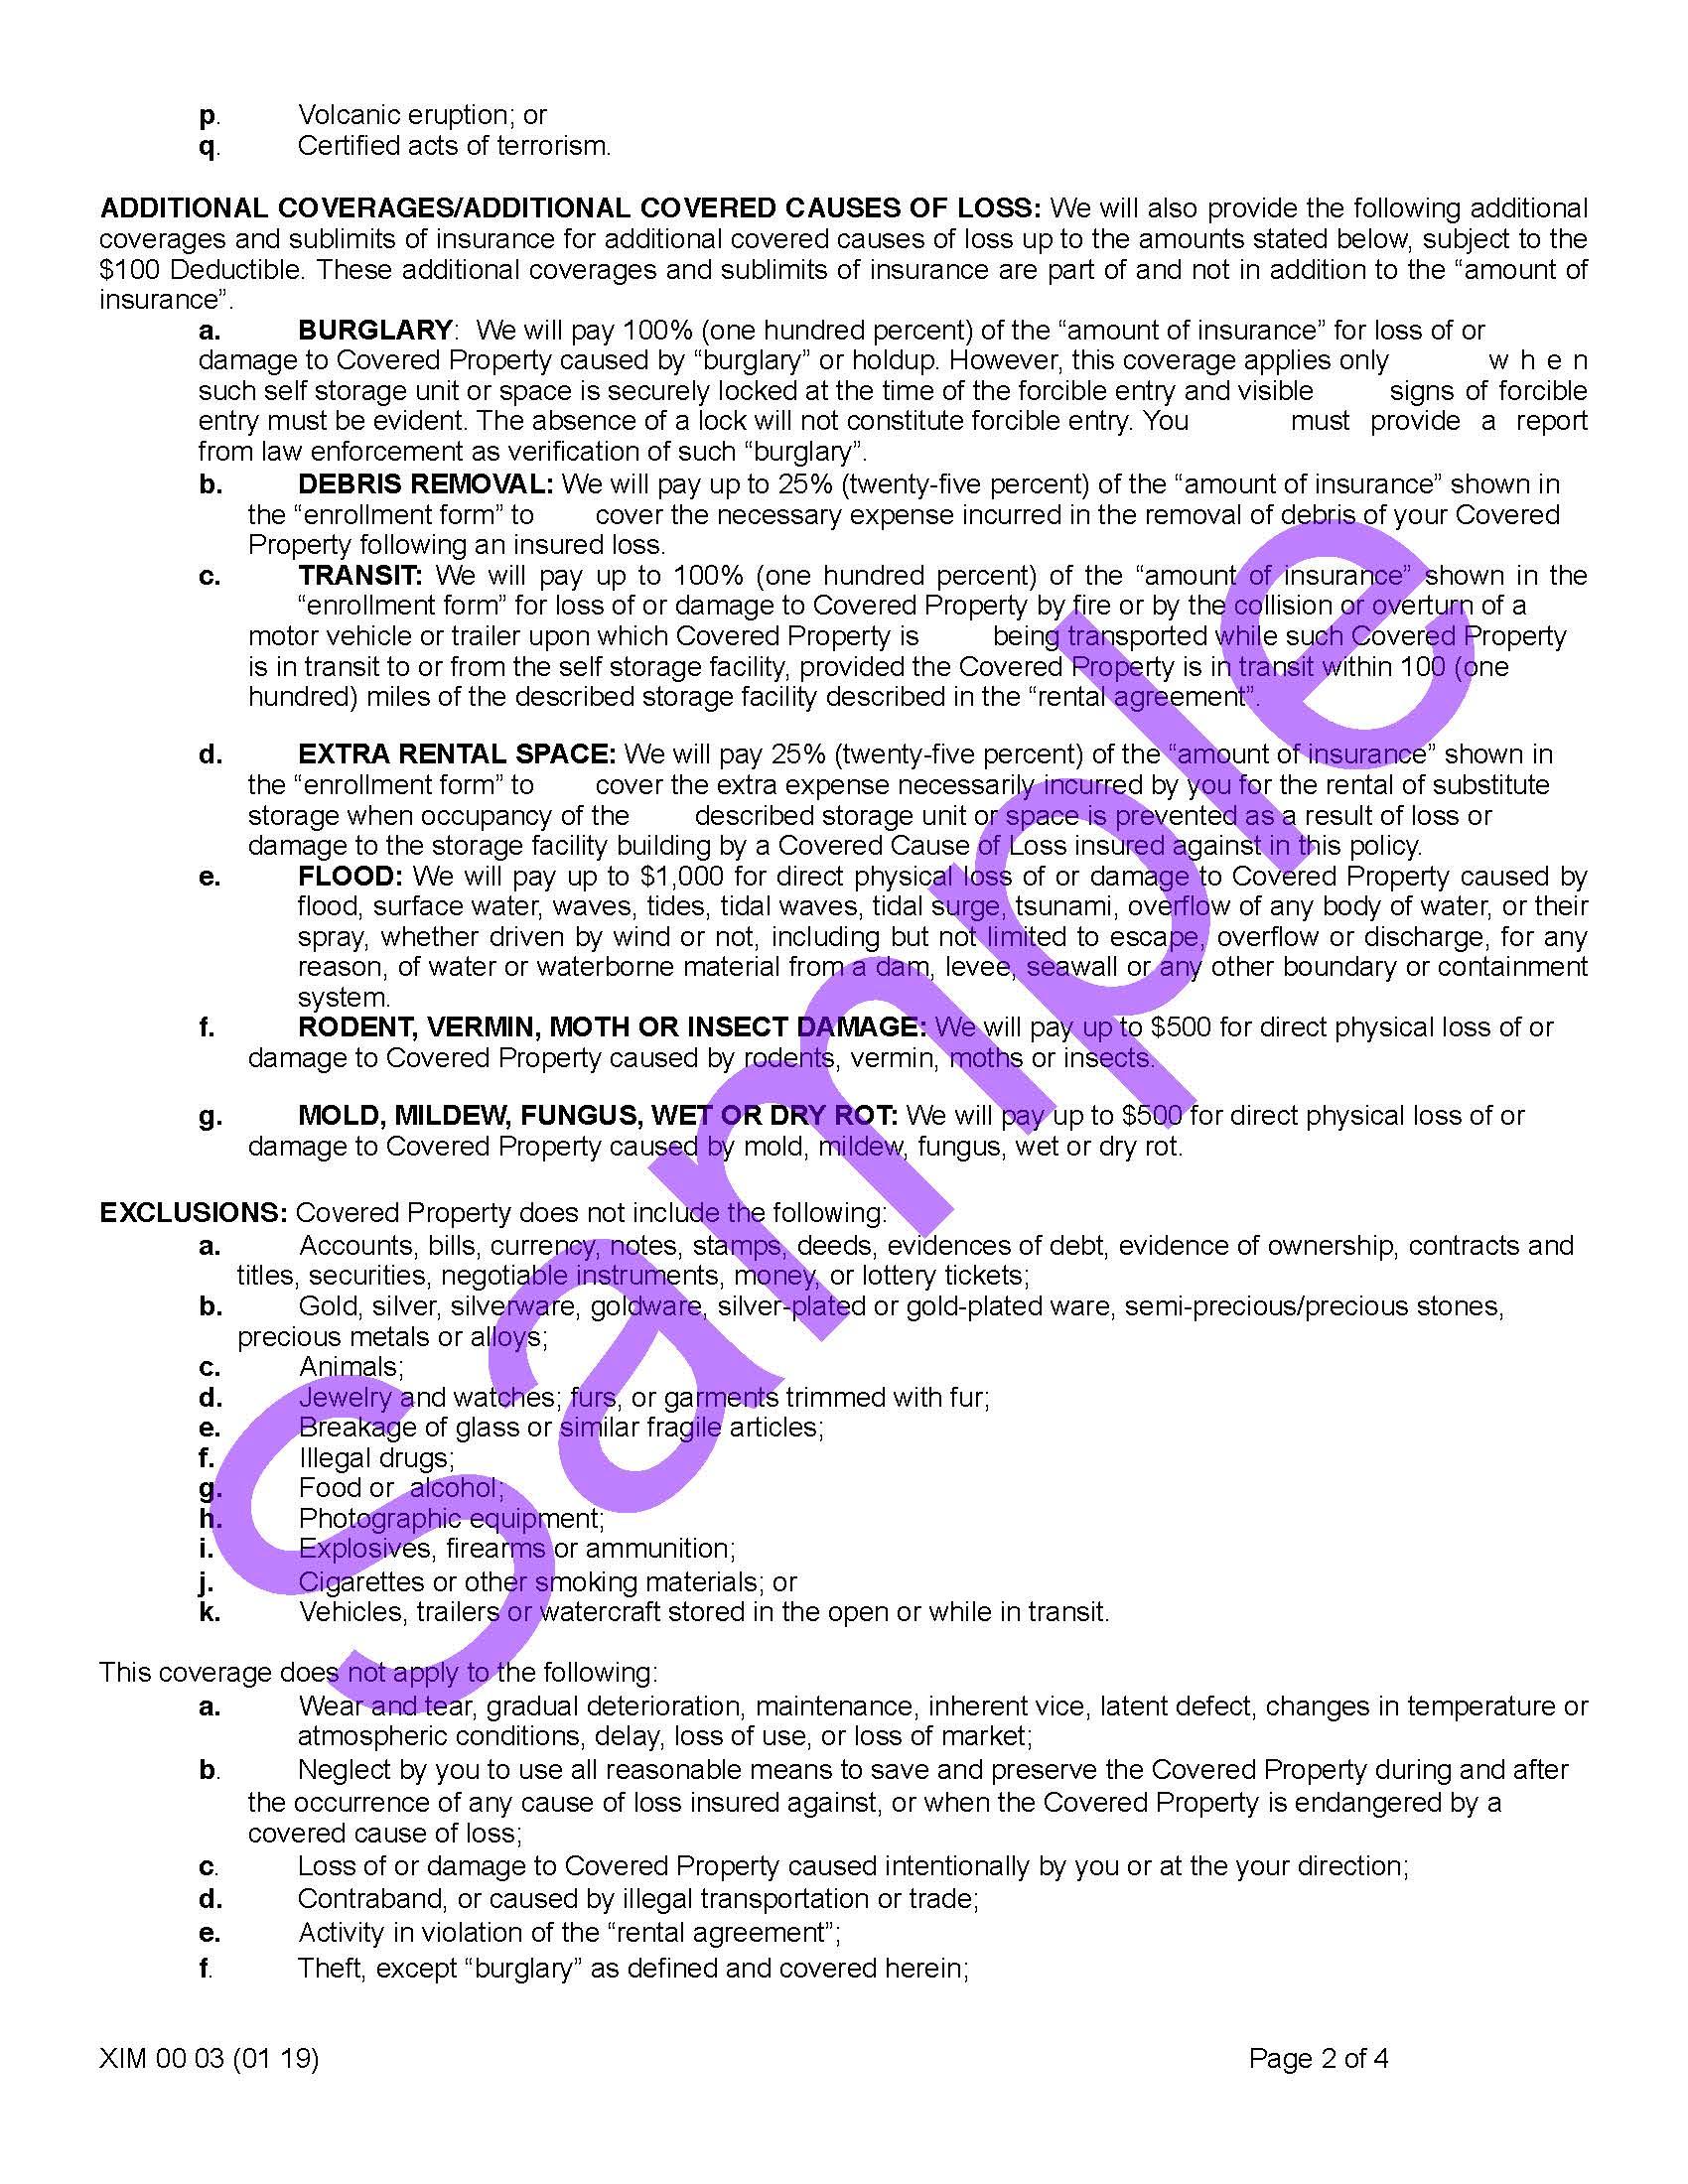 CW XIM 00 03 (01-19) Certificate of InsuranceSample_Page_2.jpg